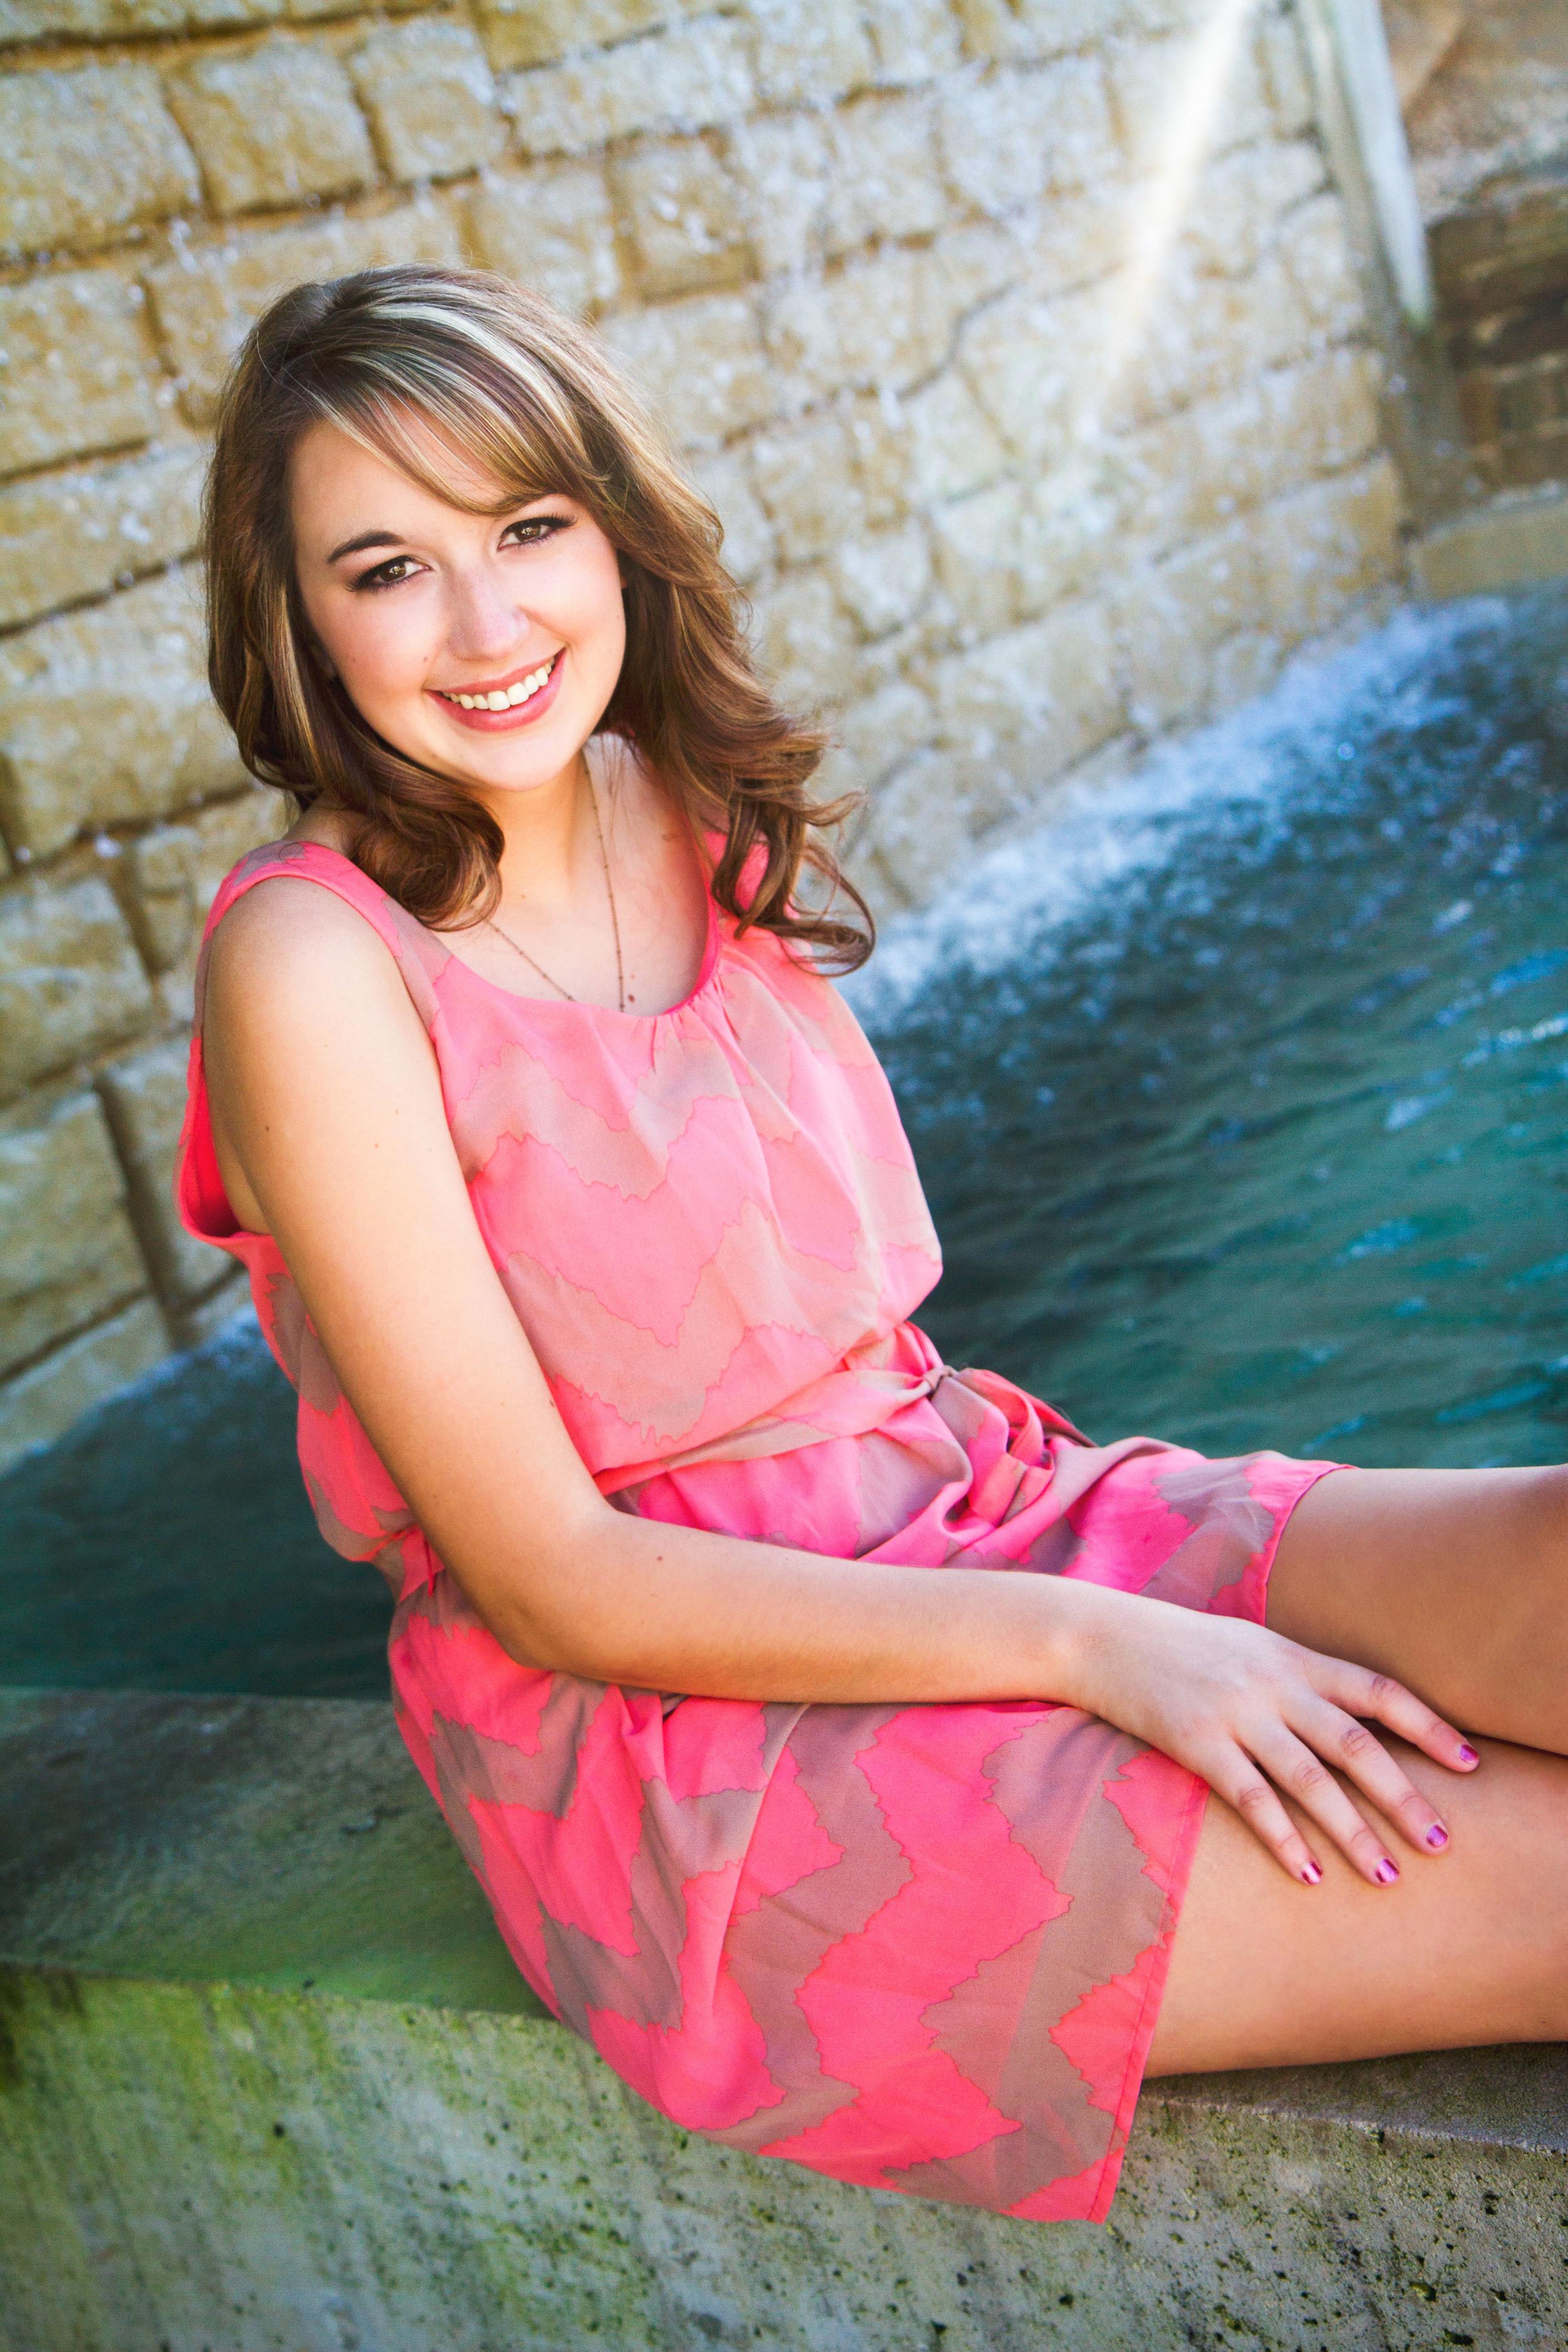 senior photos with water springfield mo